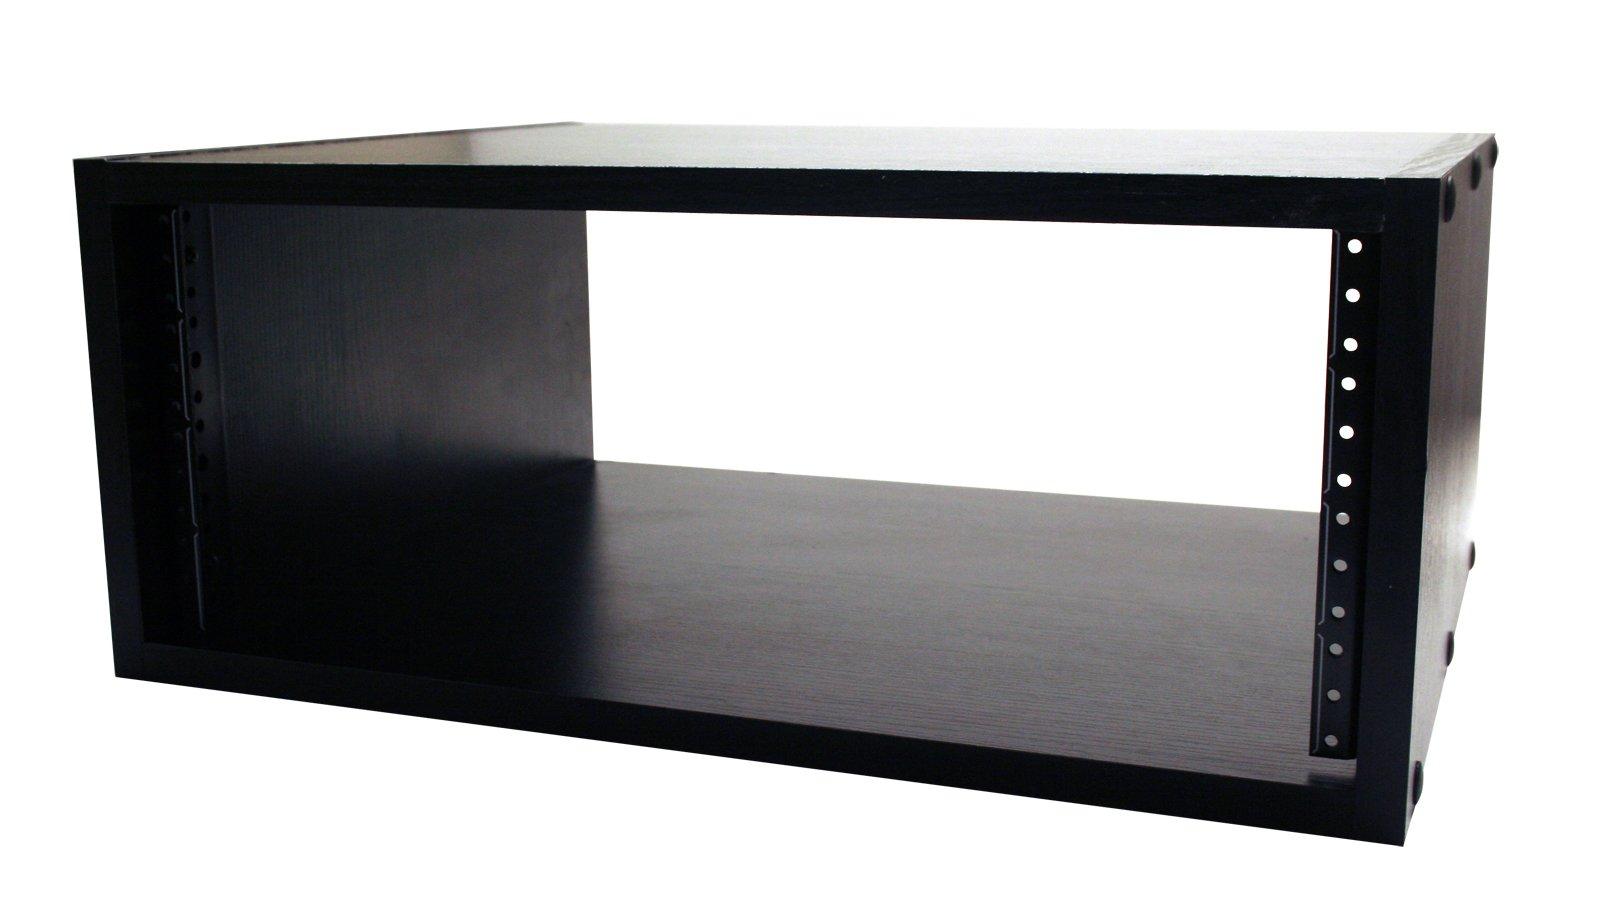 Gator Cases Wooden Studio Rack; 4U Size with 15.25'' Depth - Black (GR-STUDIO-4U) by Gator